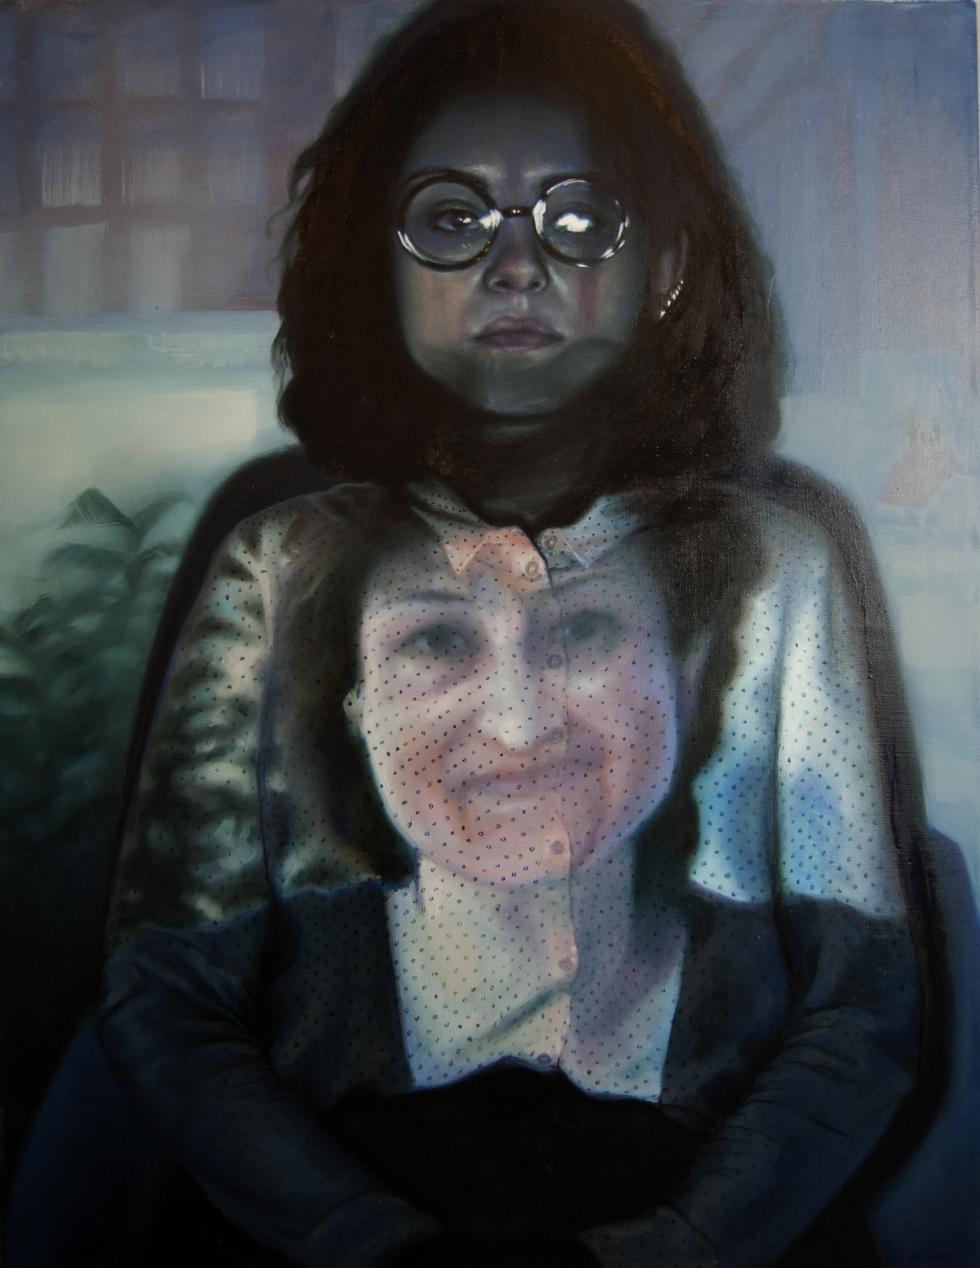 La Mare (2018) - Núria Farré Abejón